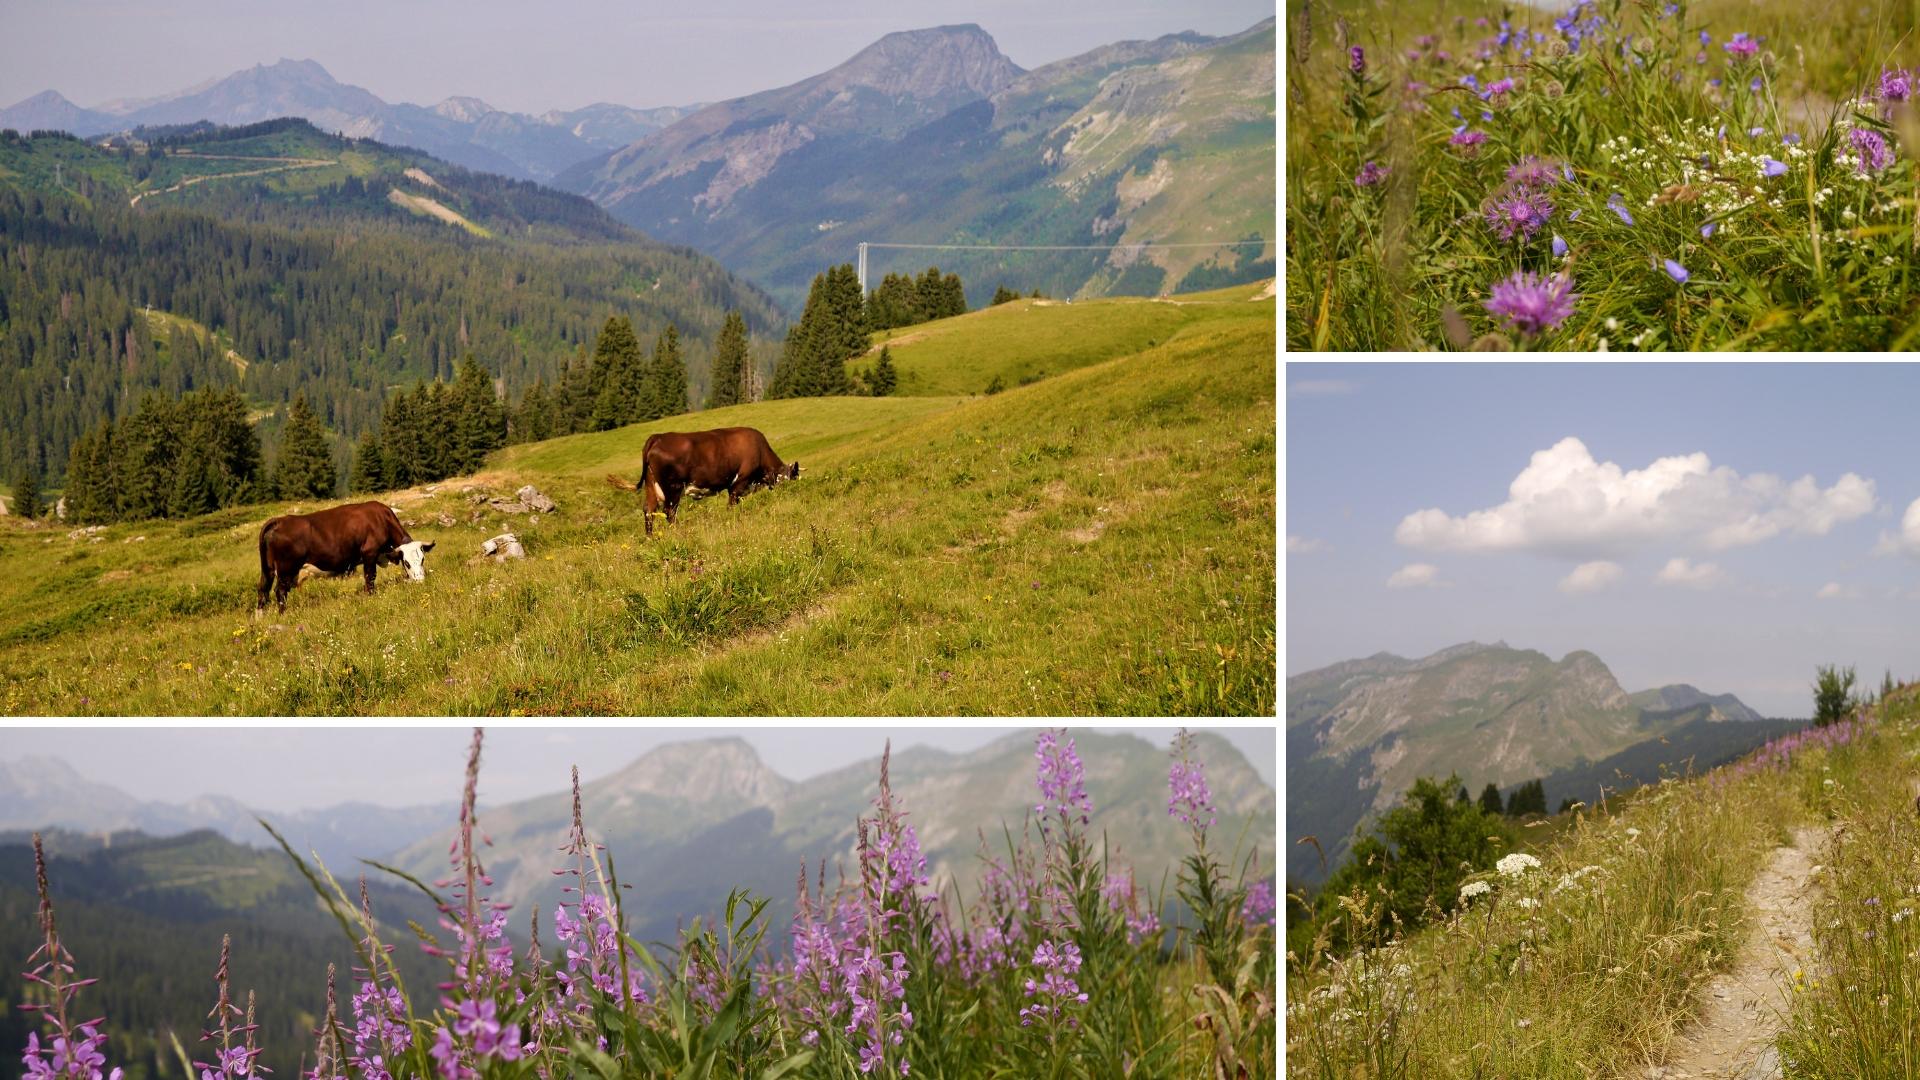 vallee abondance chatel haute-savoie blog voyage france arpenter le chemin